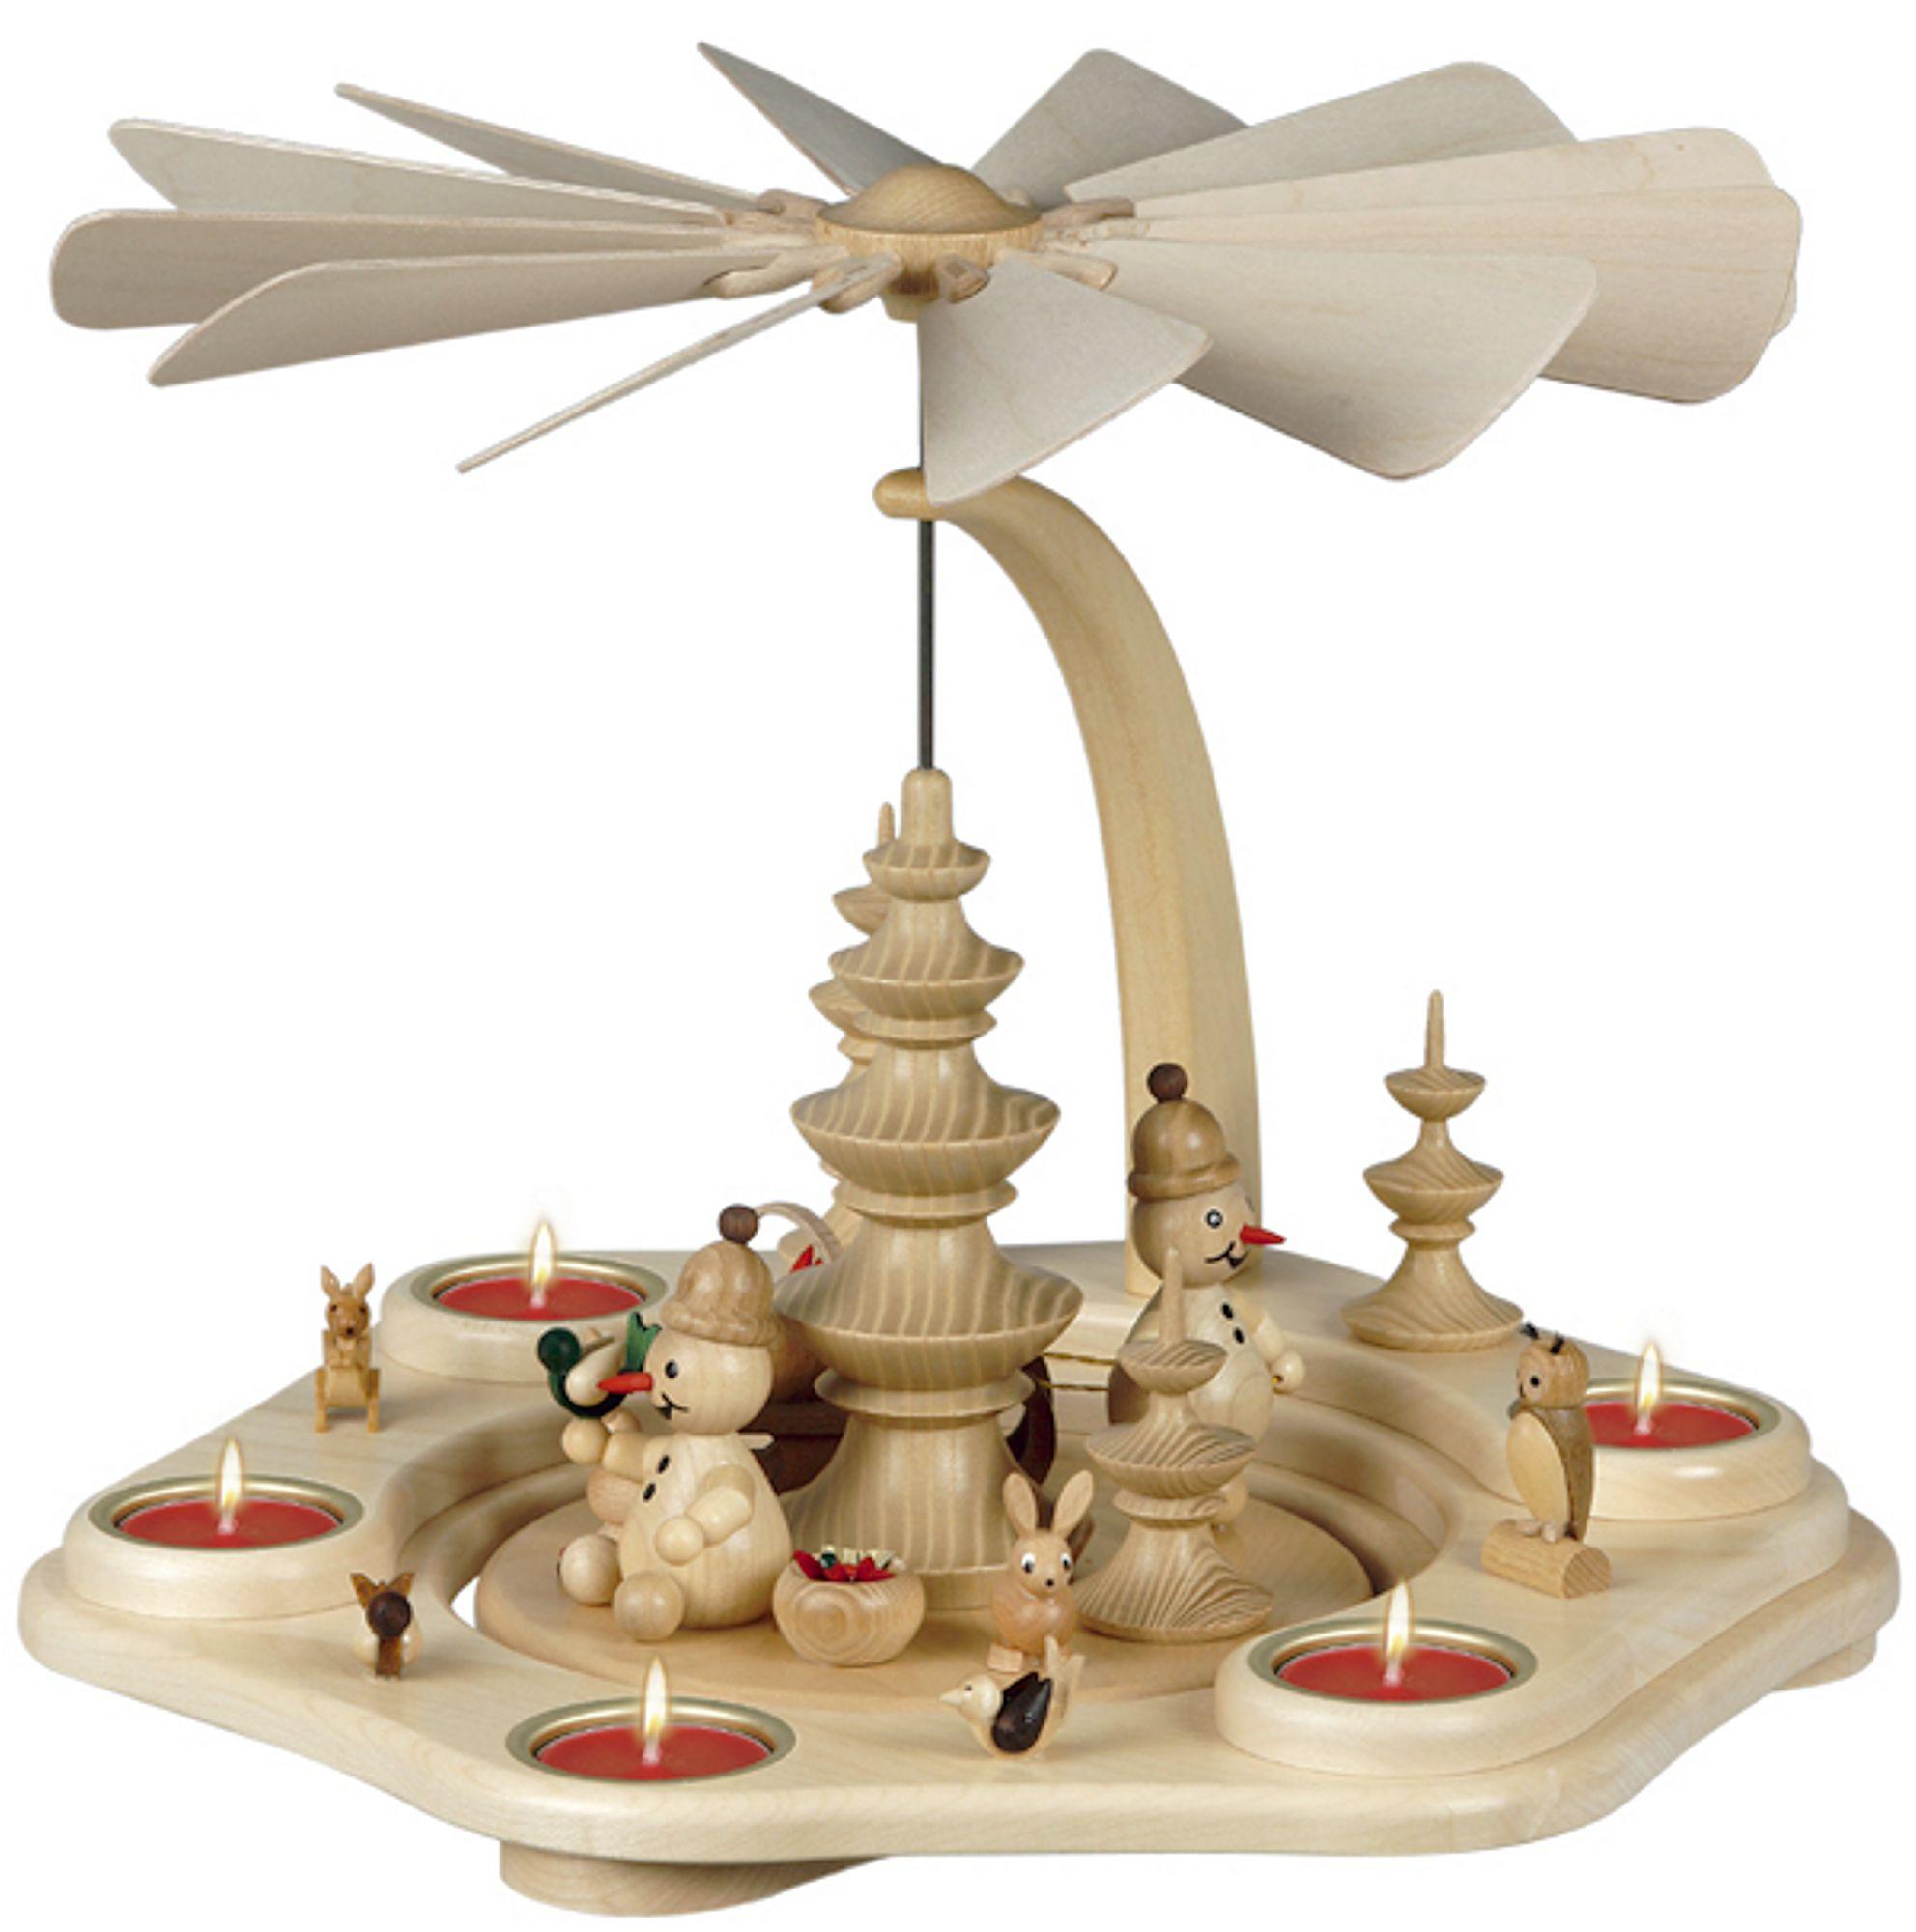 Drechslerei Volkmar Wagner Teelichtpyramide Junior mit Tieren